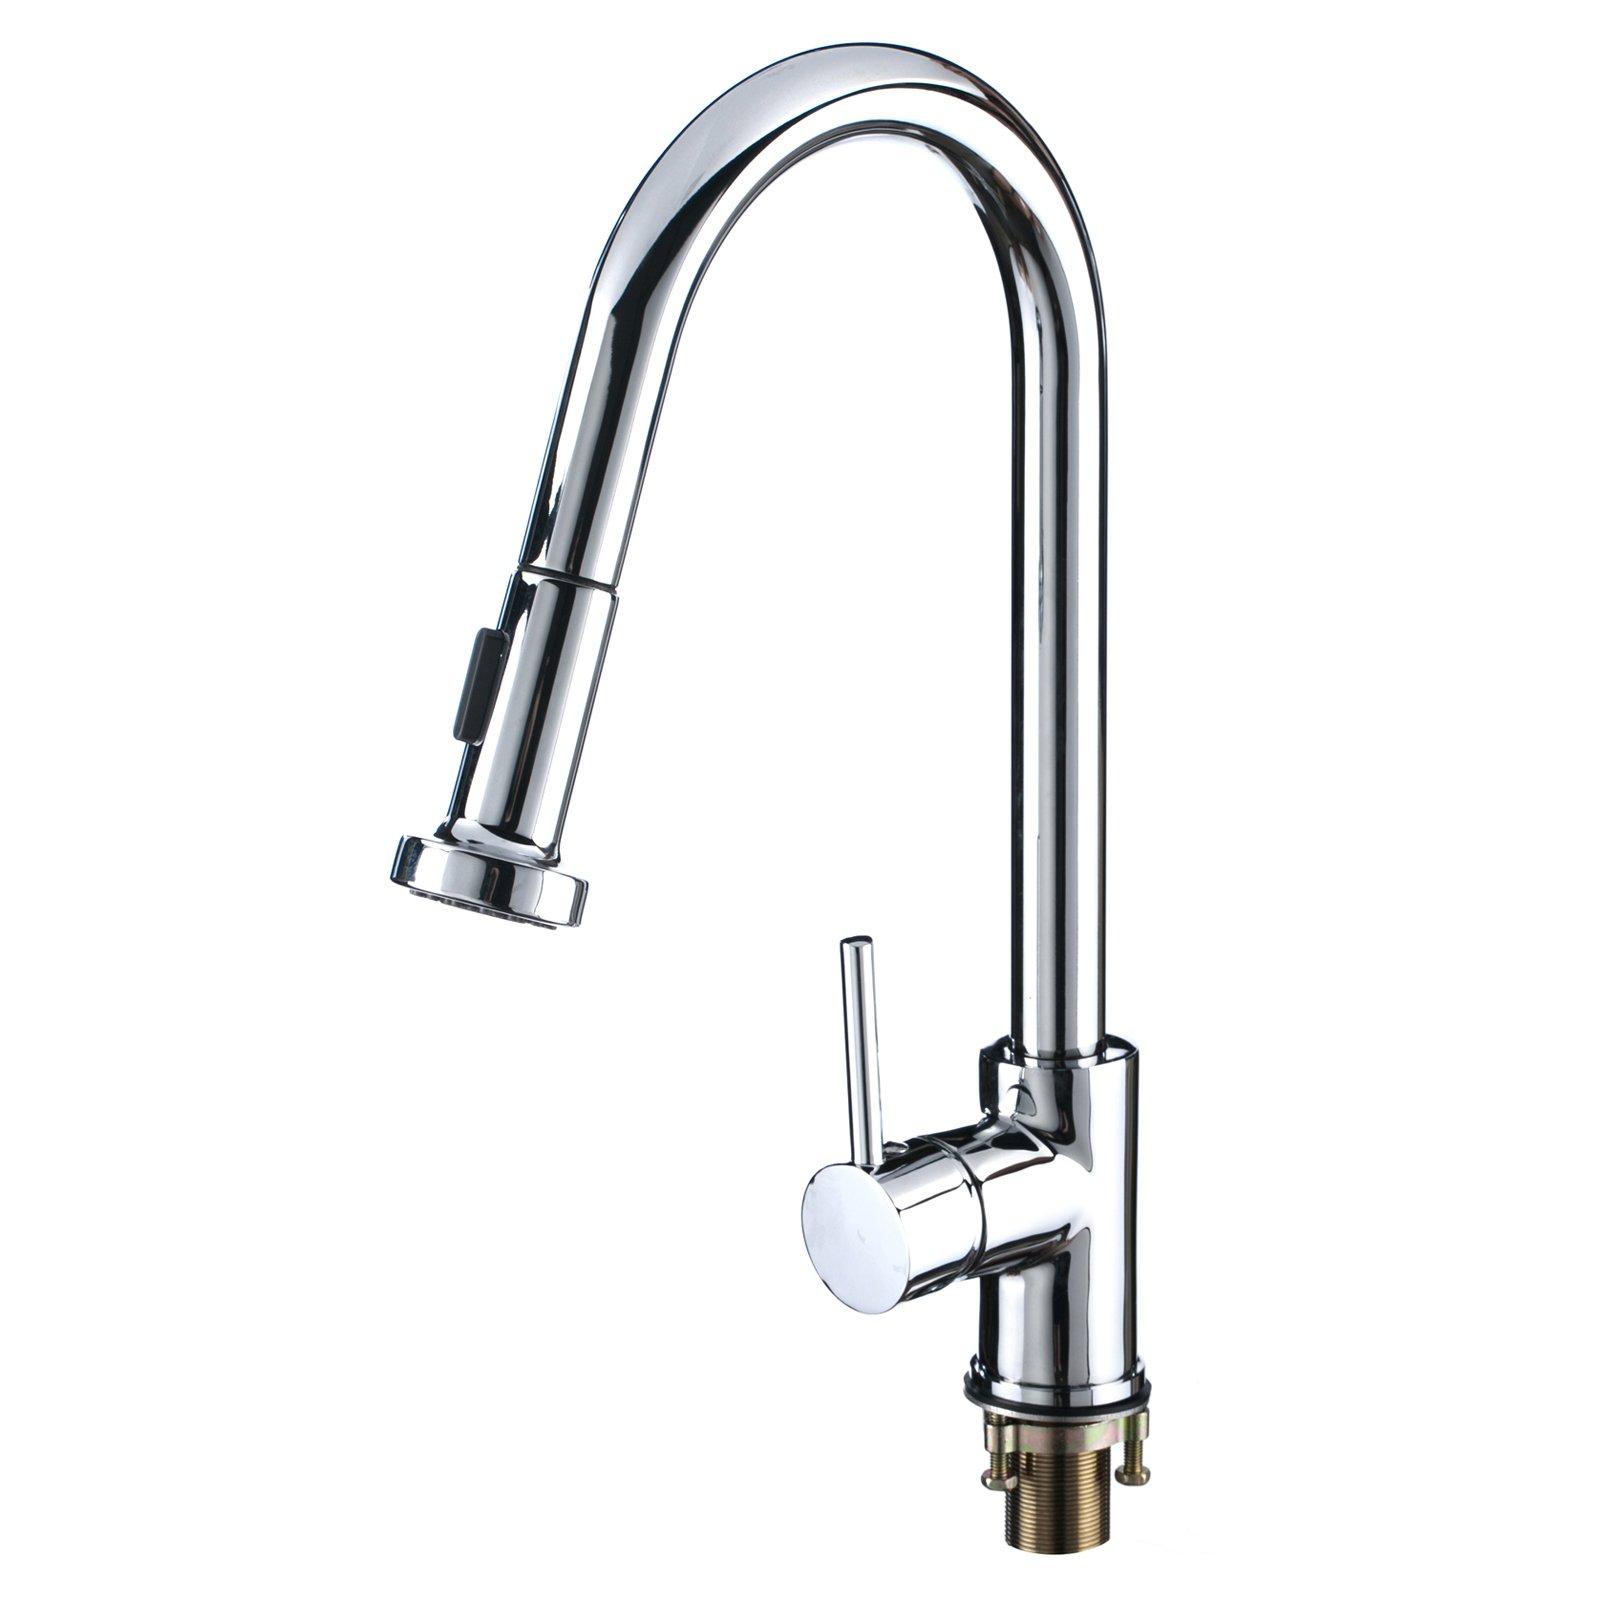 Kokols 16 Pull Out Spray Swivel Spout Chrome Kitchen Sink Faucet